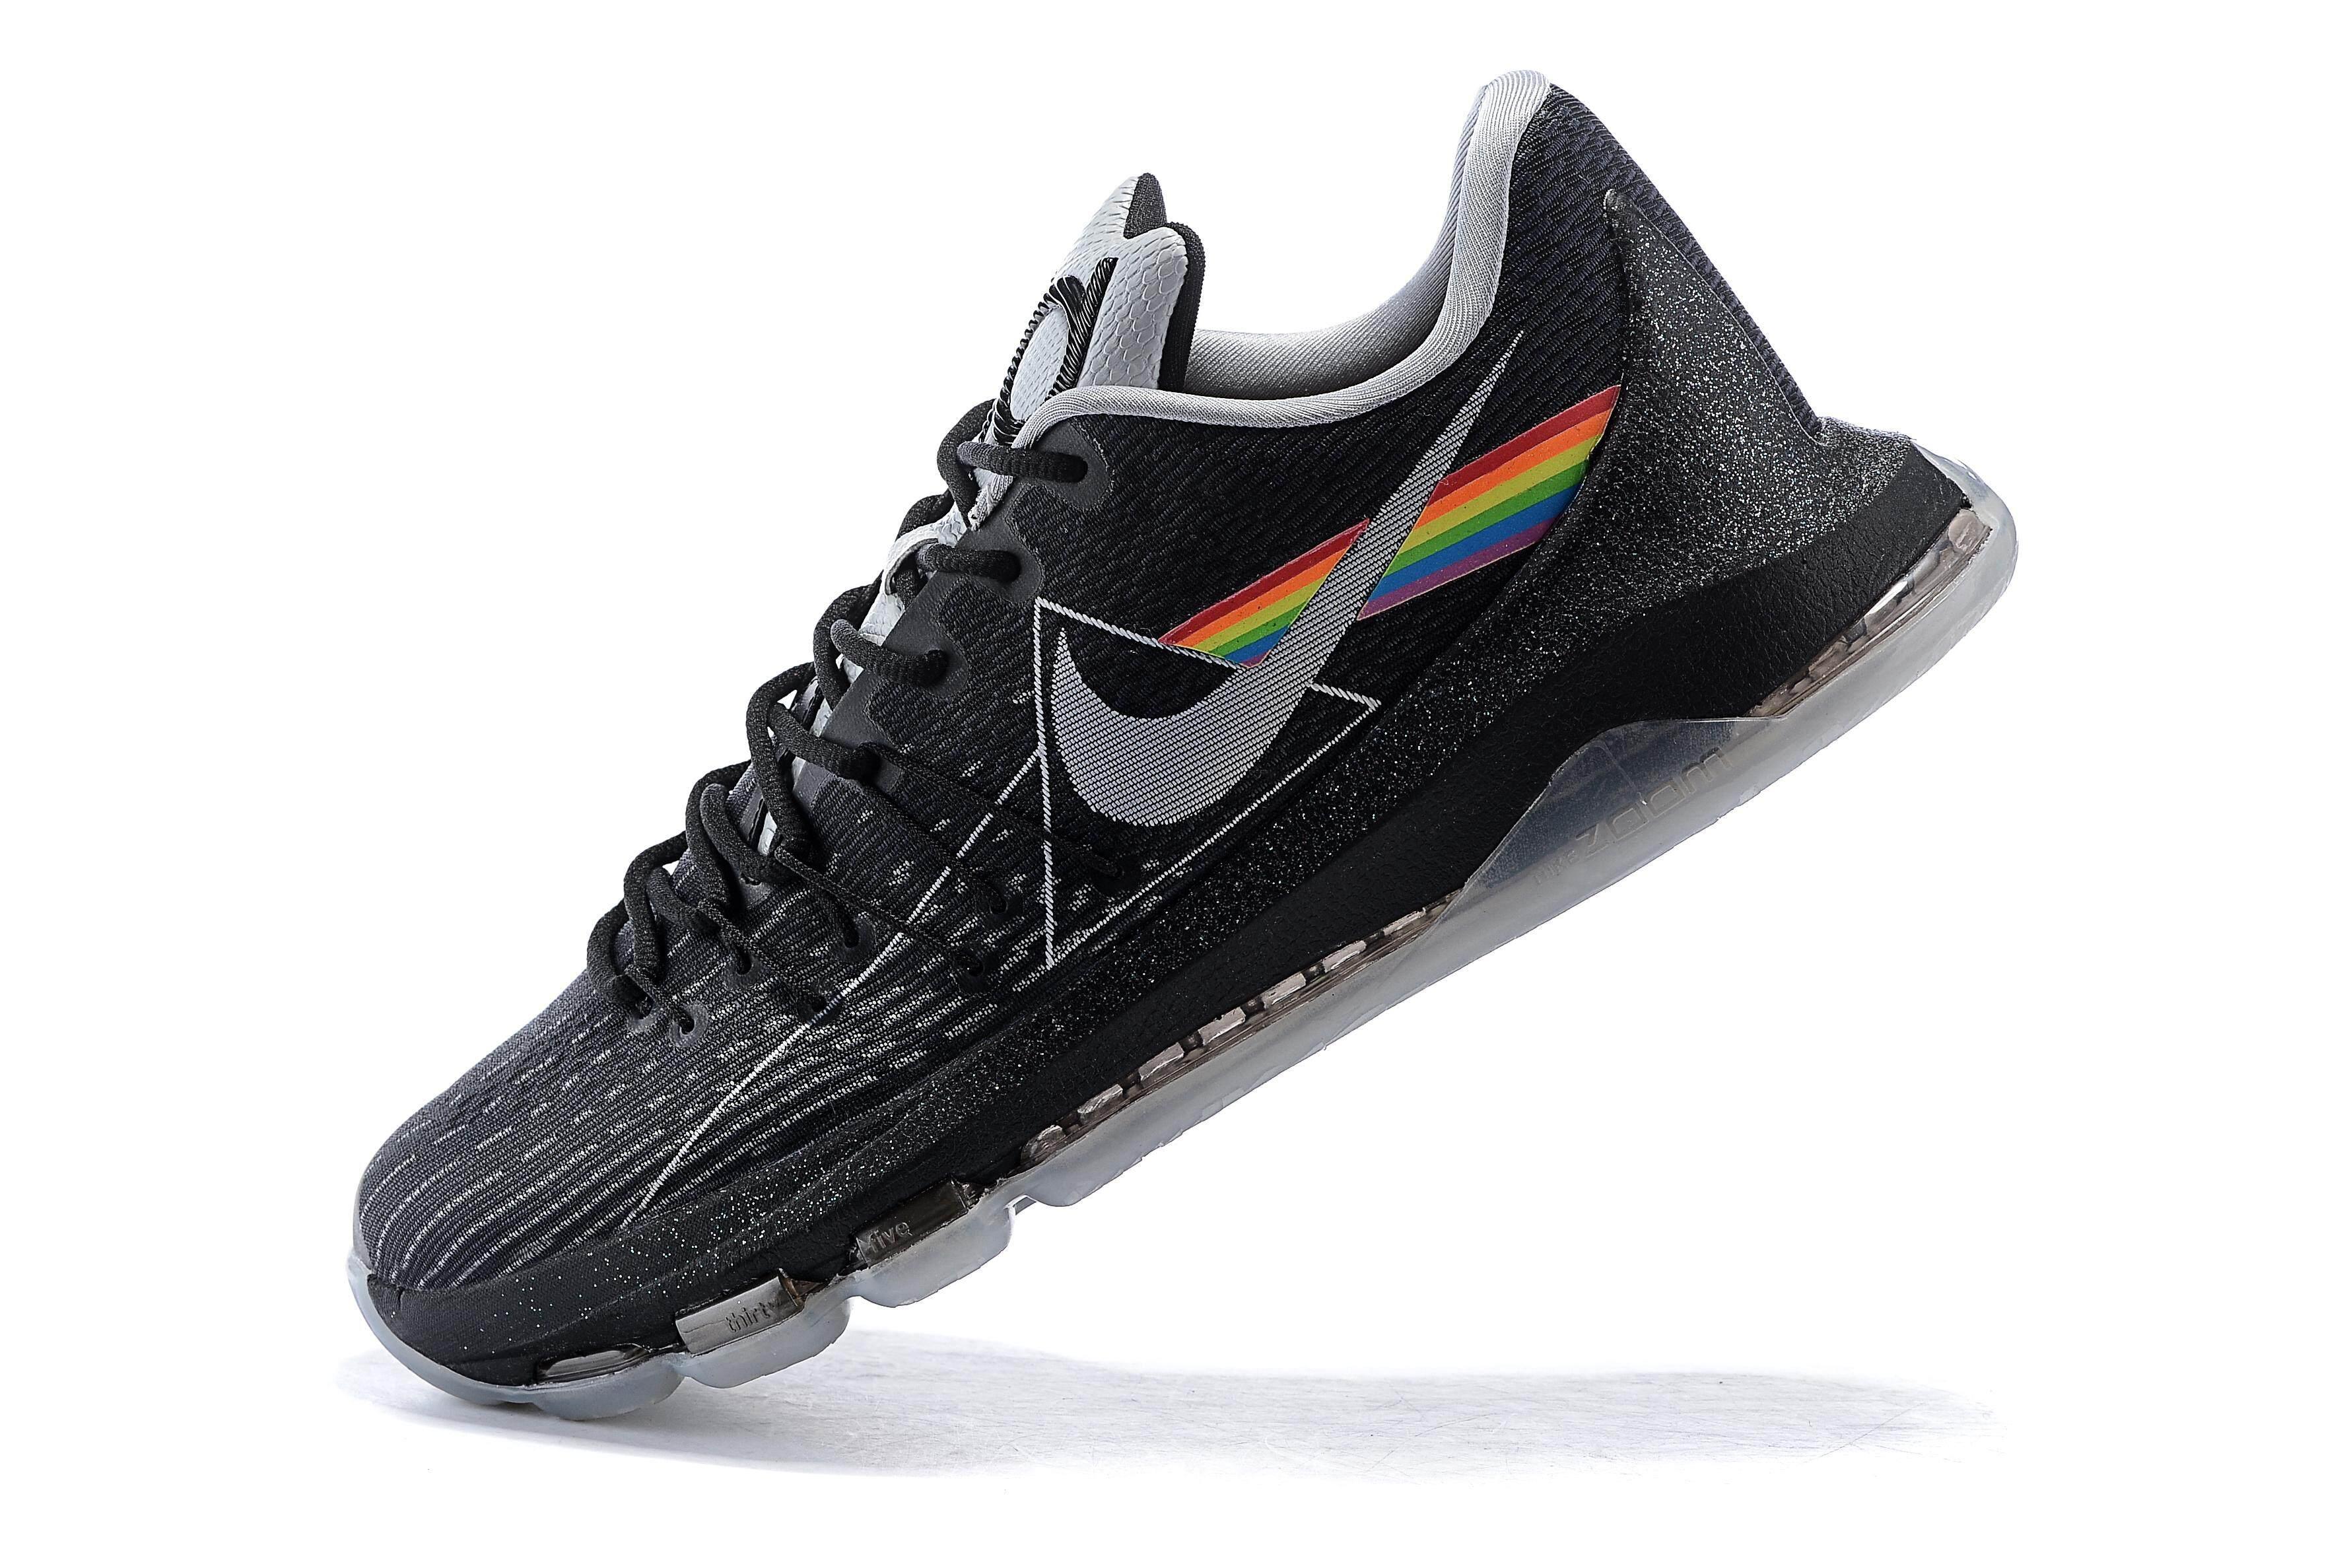 c02e8b5f61 Nike Men s Basketball Shoes price in Malaysia - Best Nike Men s ...